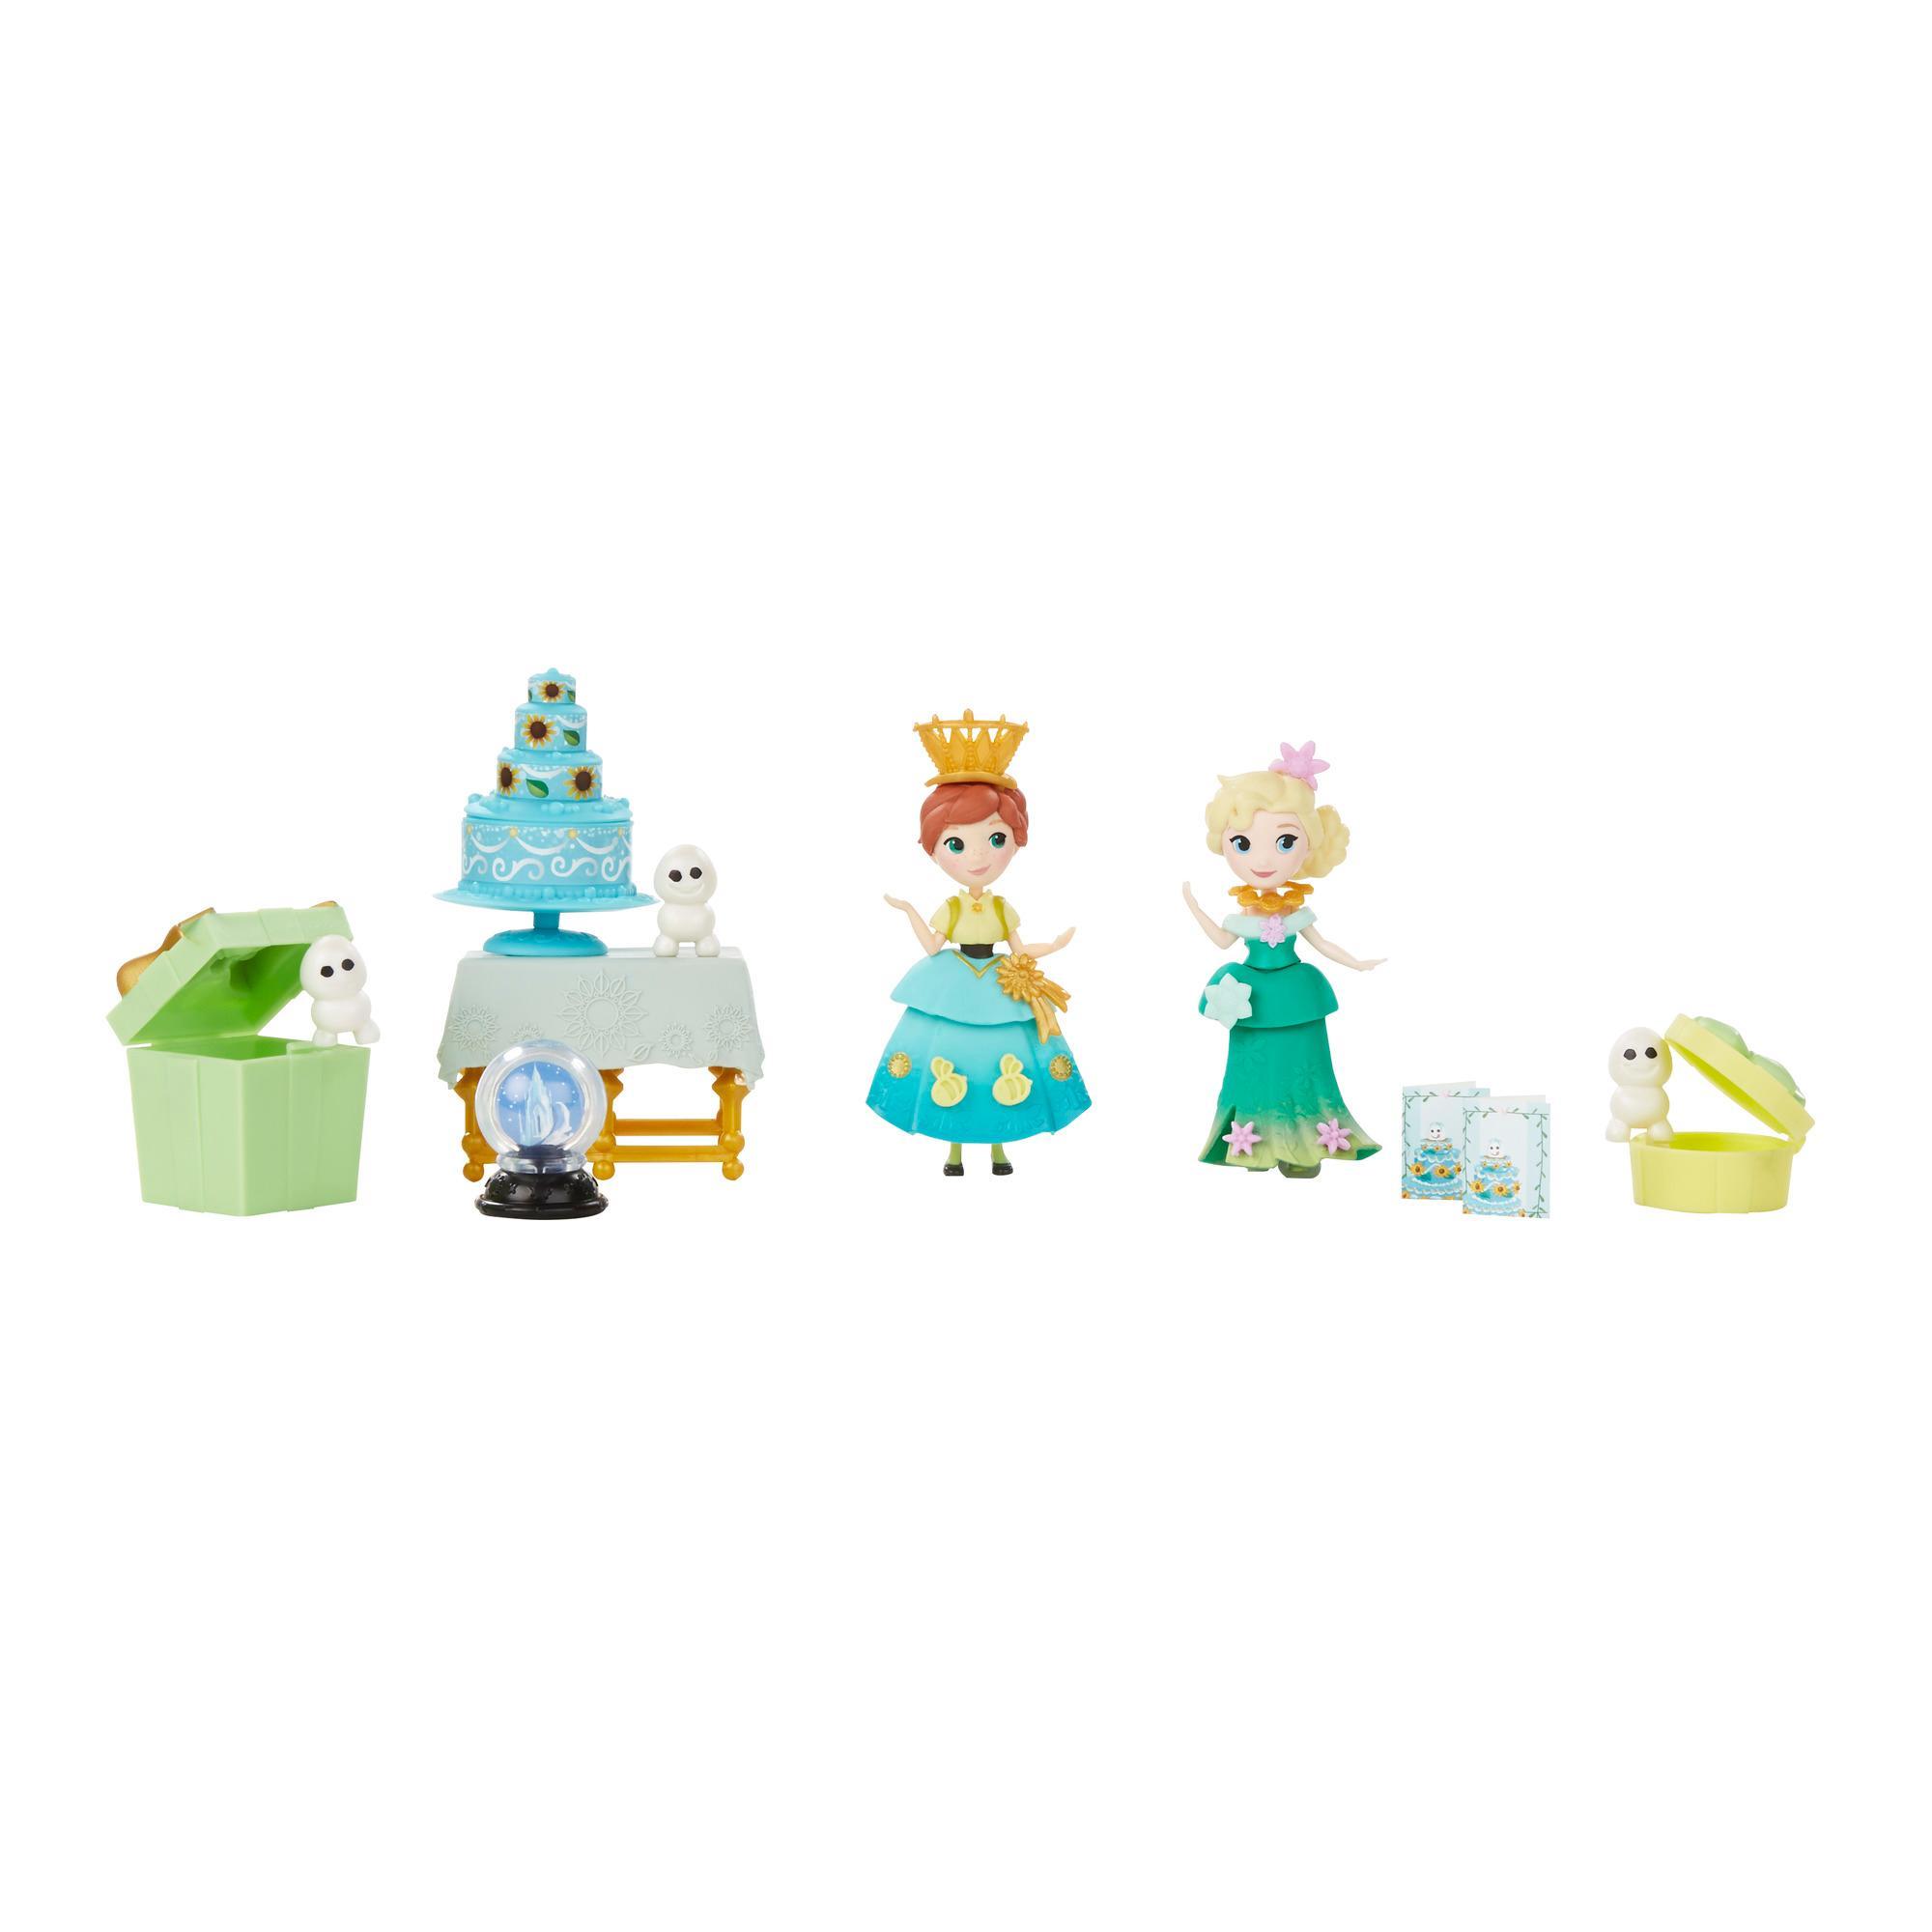 Disney Frozen Little Kingdom Frozen Fever Celebration Set